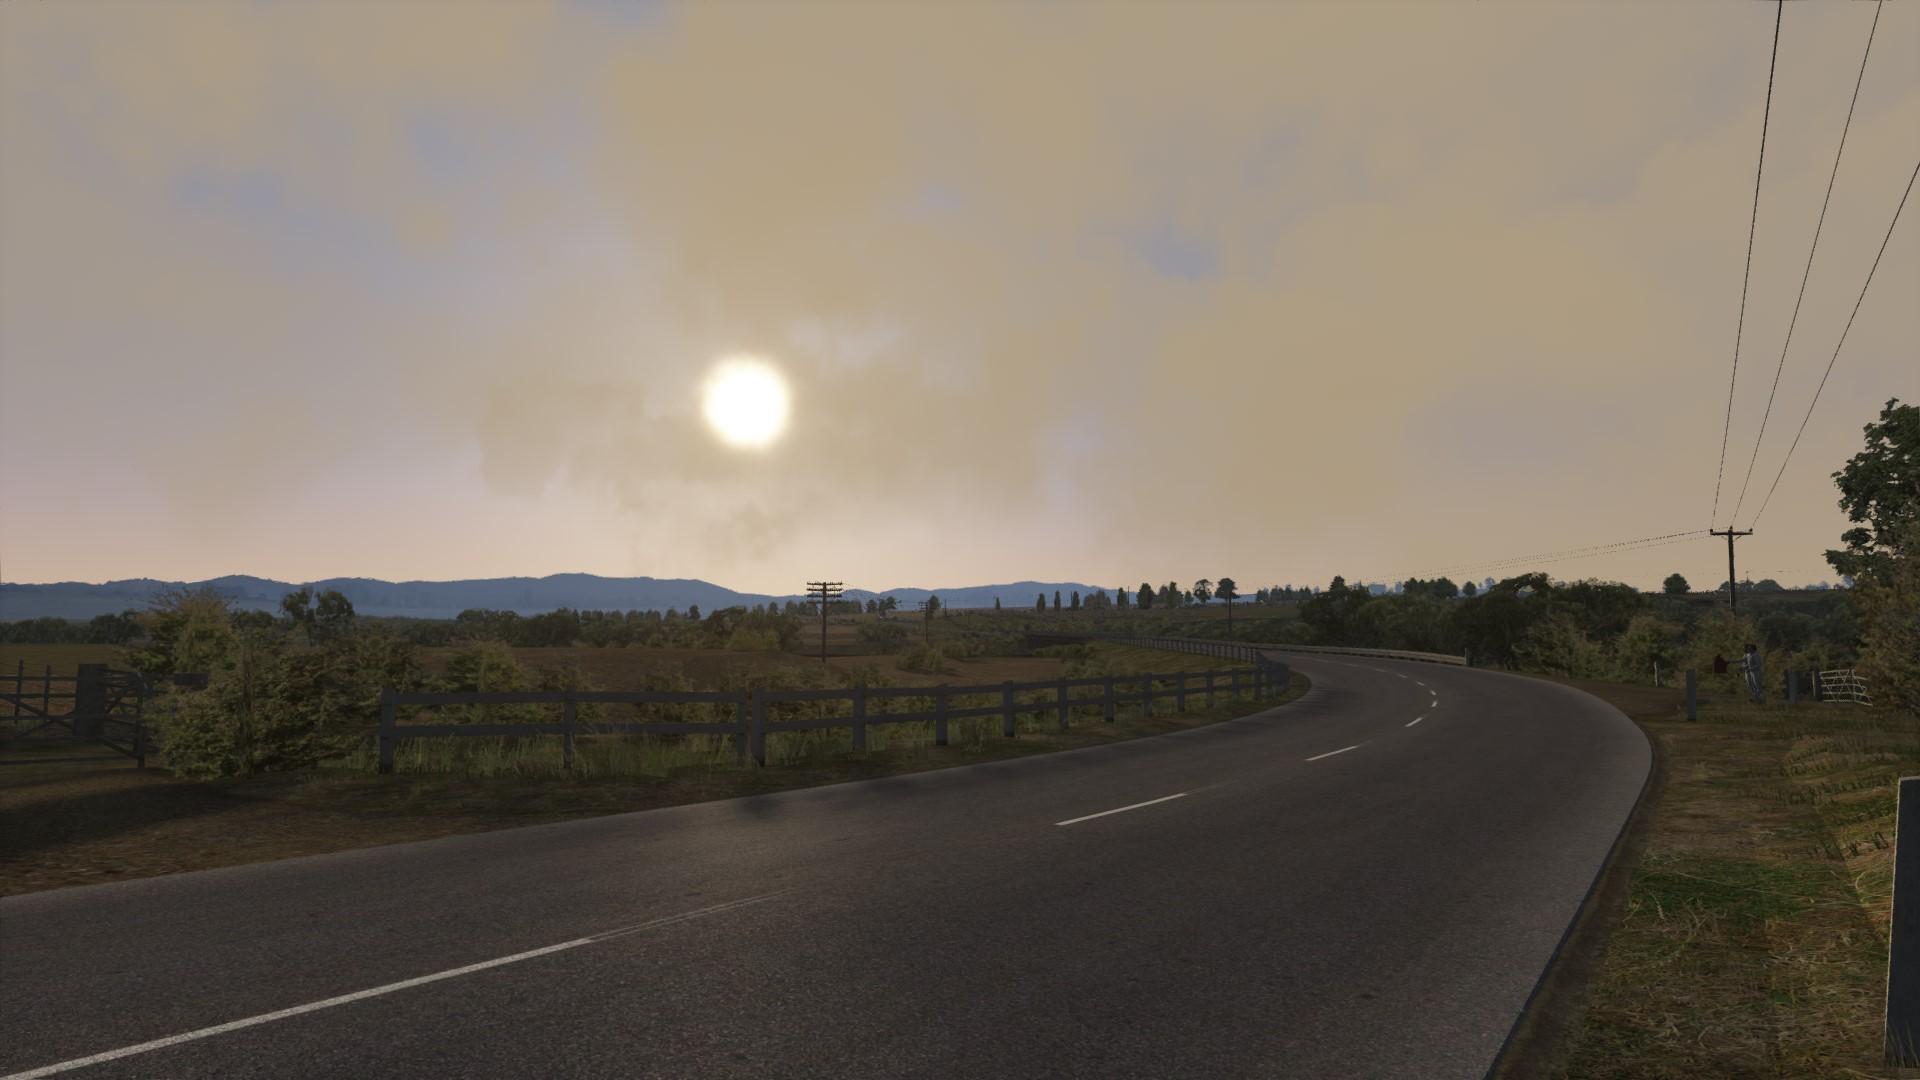 Screenshot_renault_meg250_longford_67_13-4-116-12-21-26.jpg